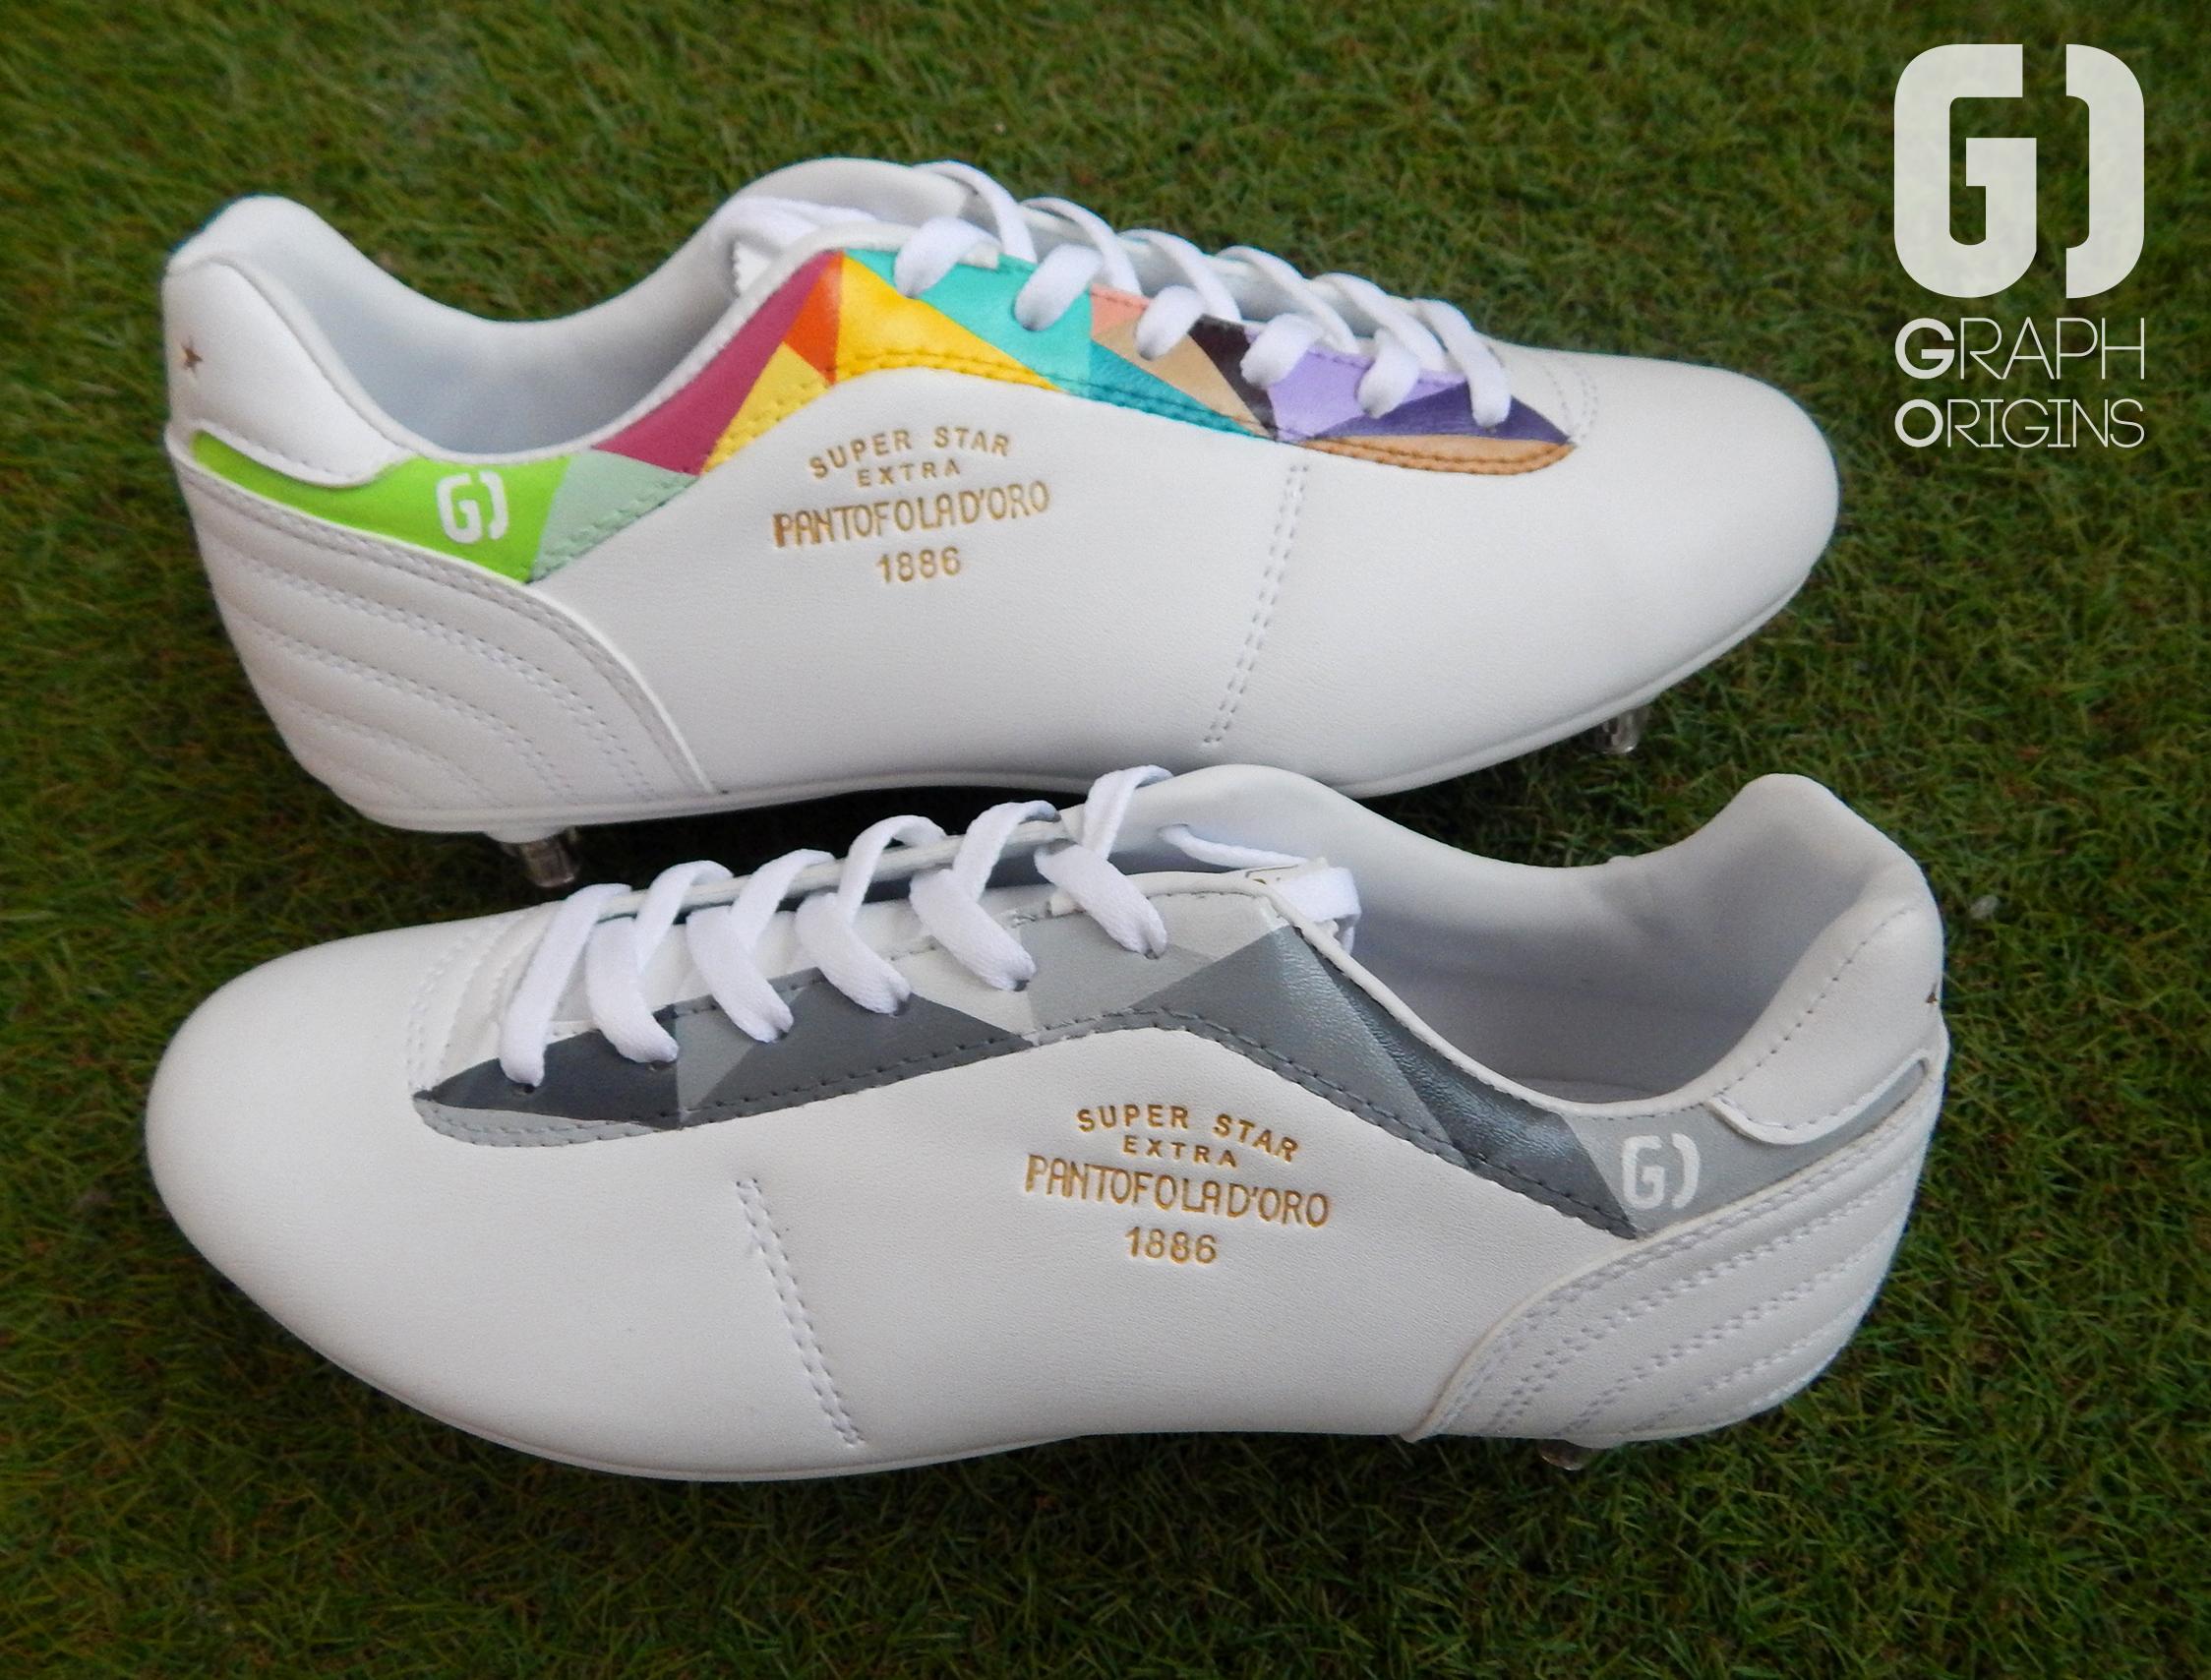 Custom chaussures football pantofola d'oro griezmann graph origins 5